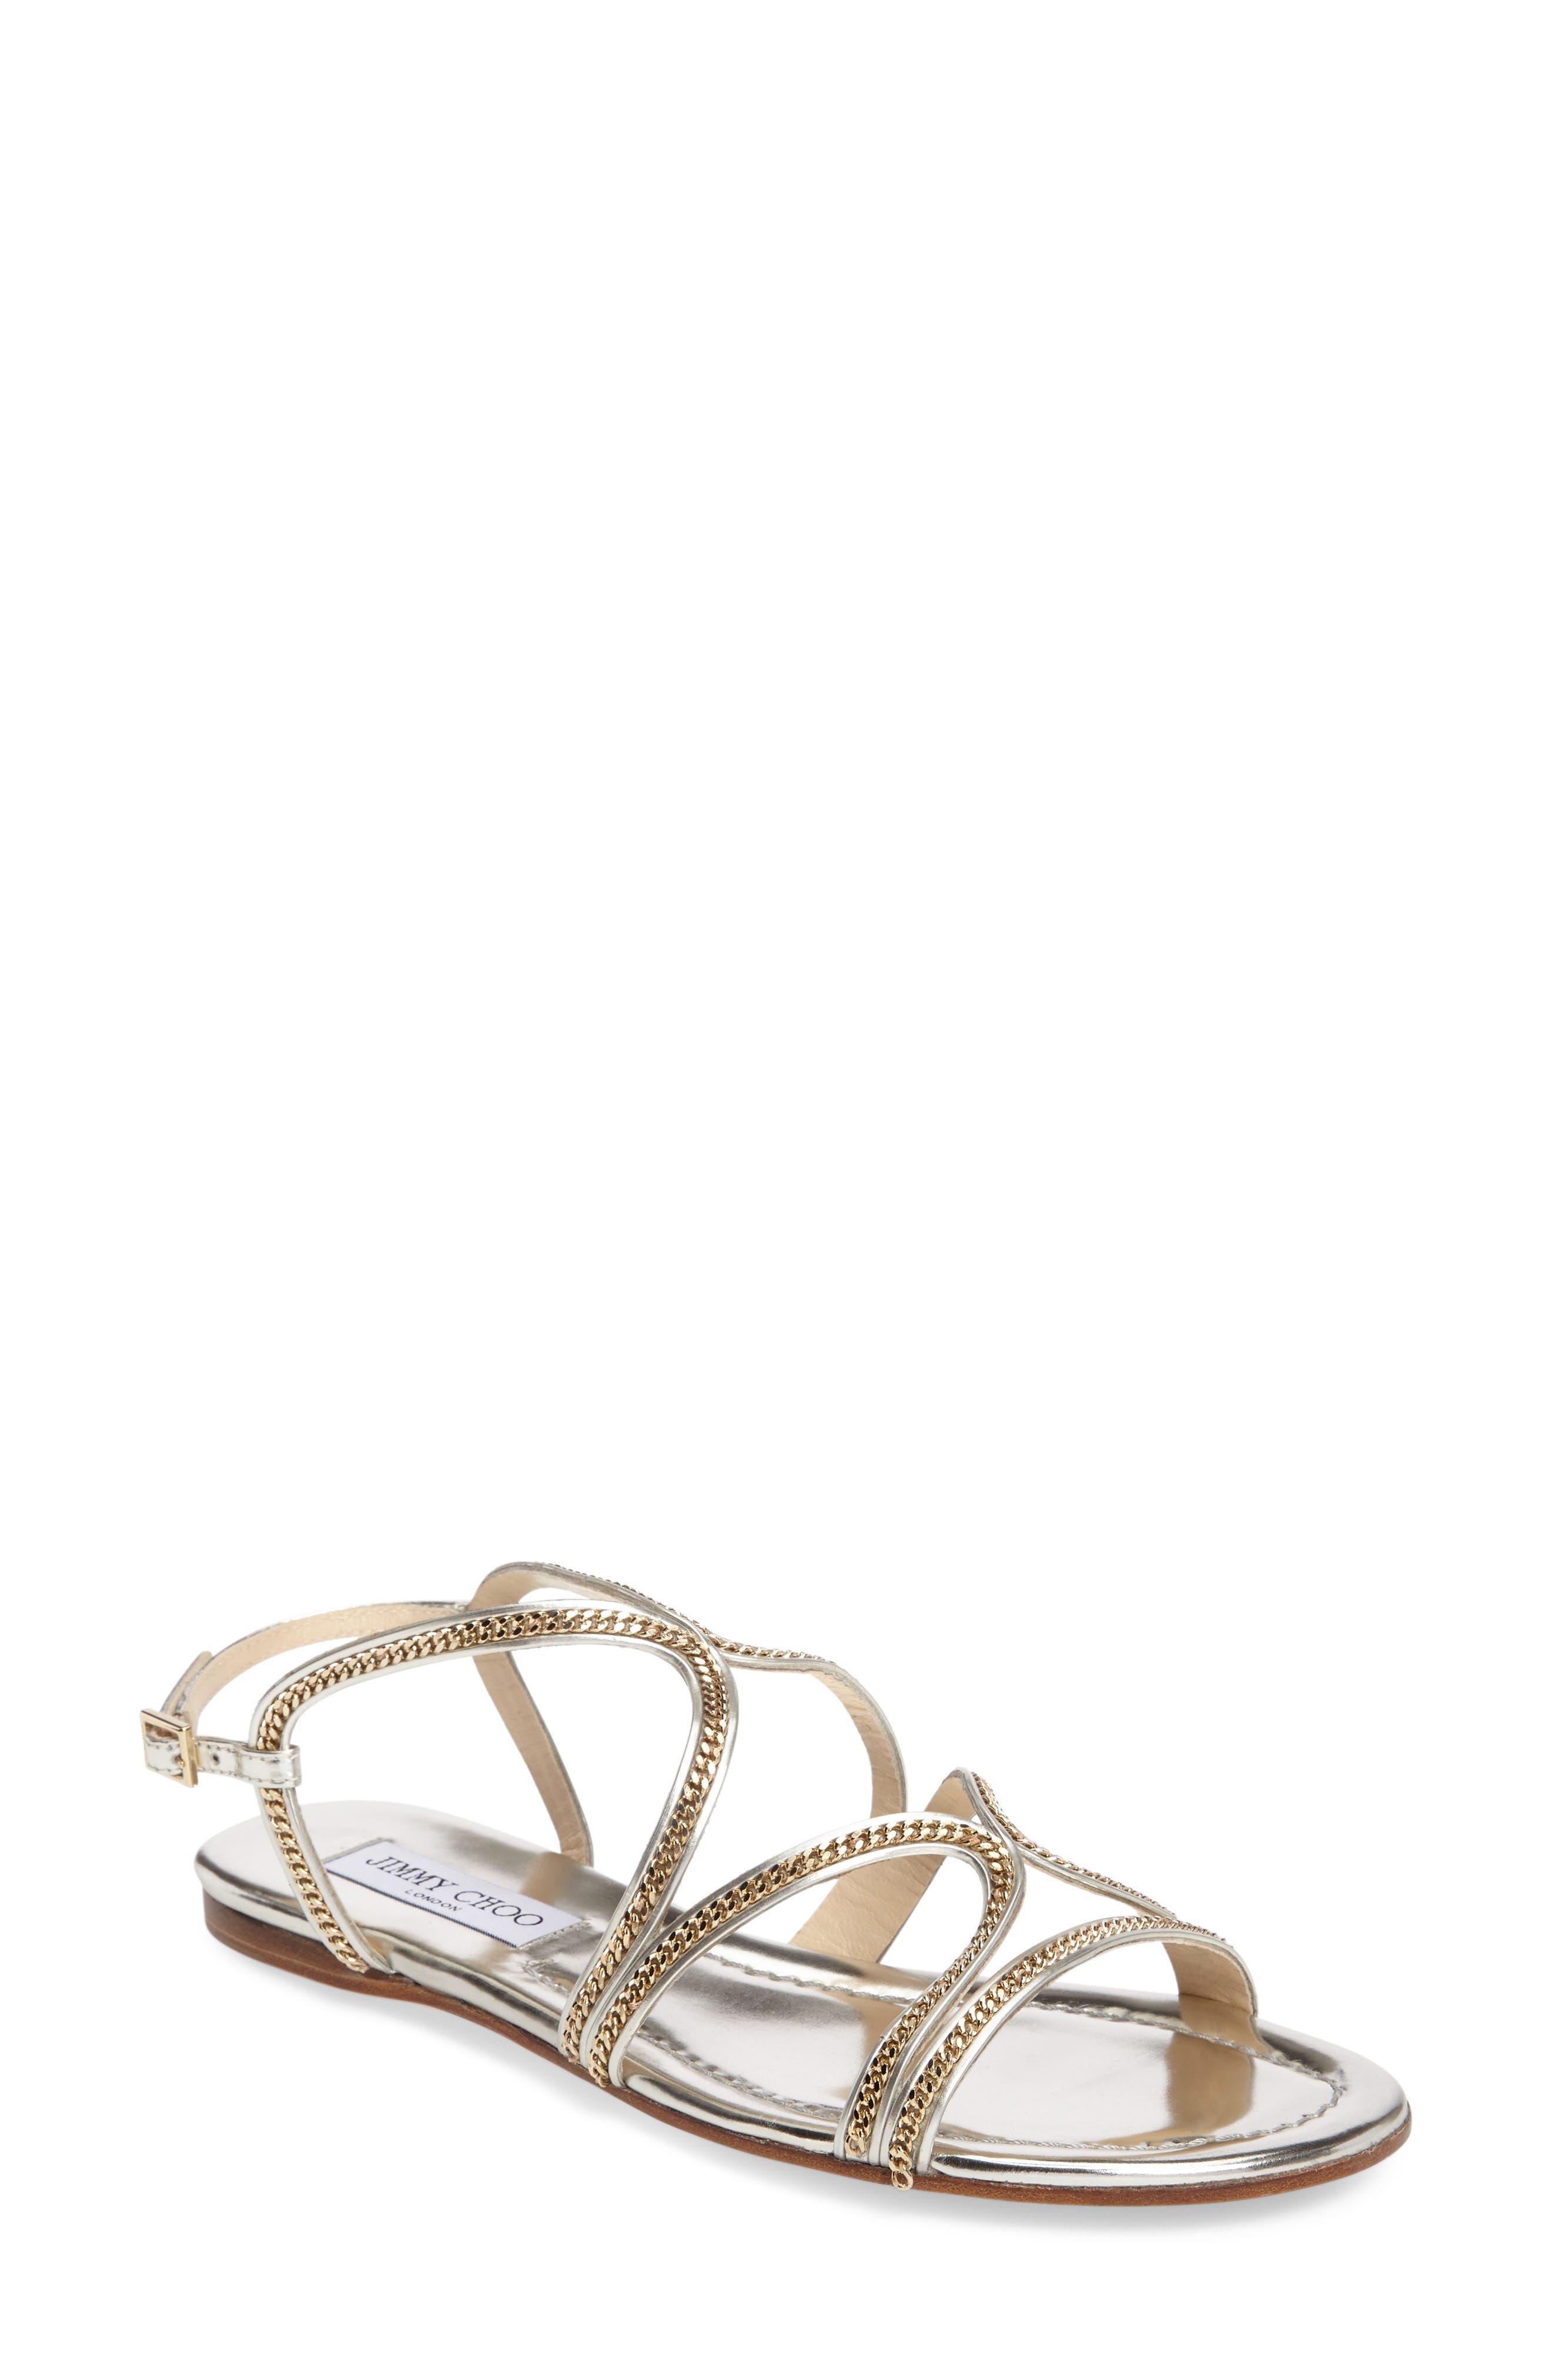 Main Image - Jimmy Choo Nickel Flat Sandal (Women)